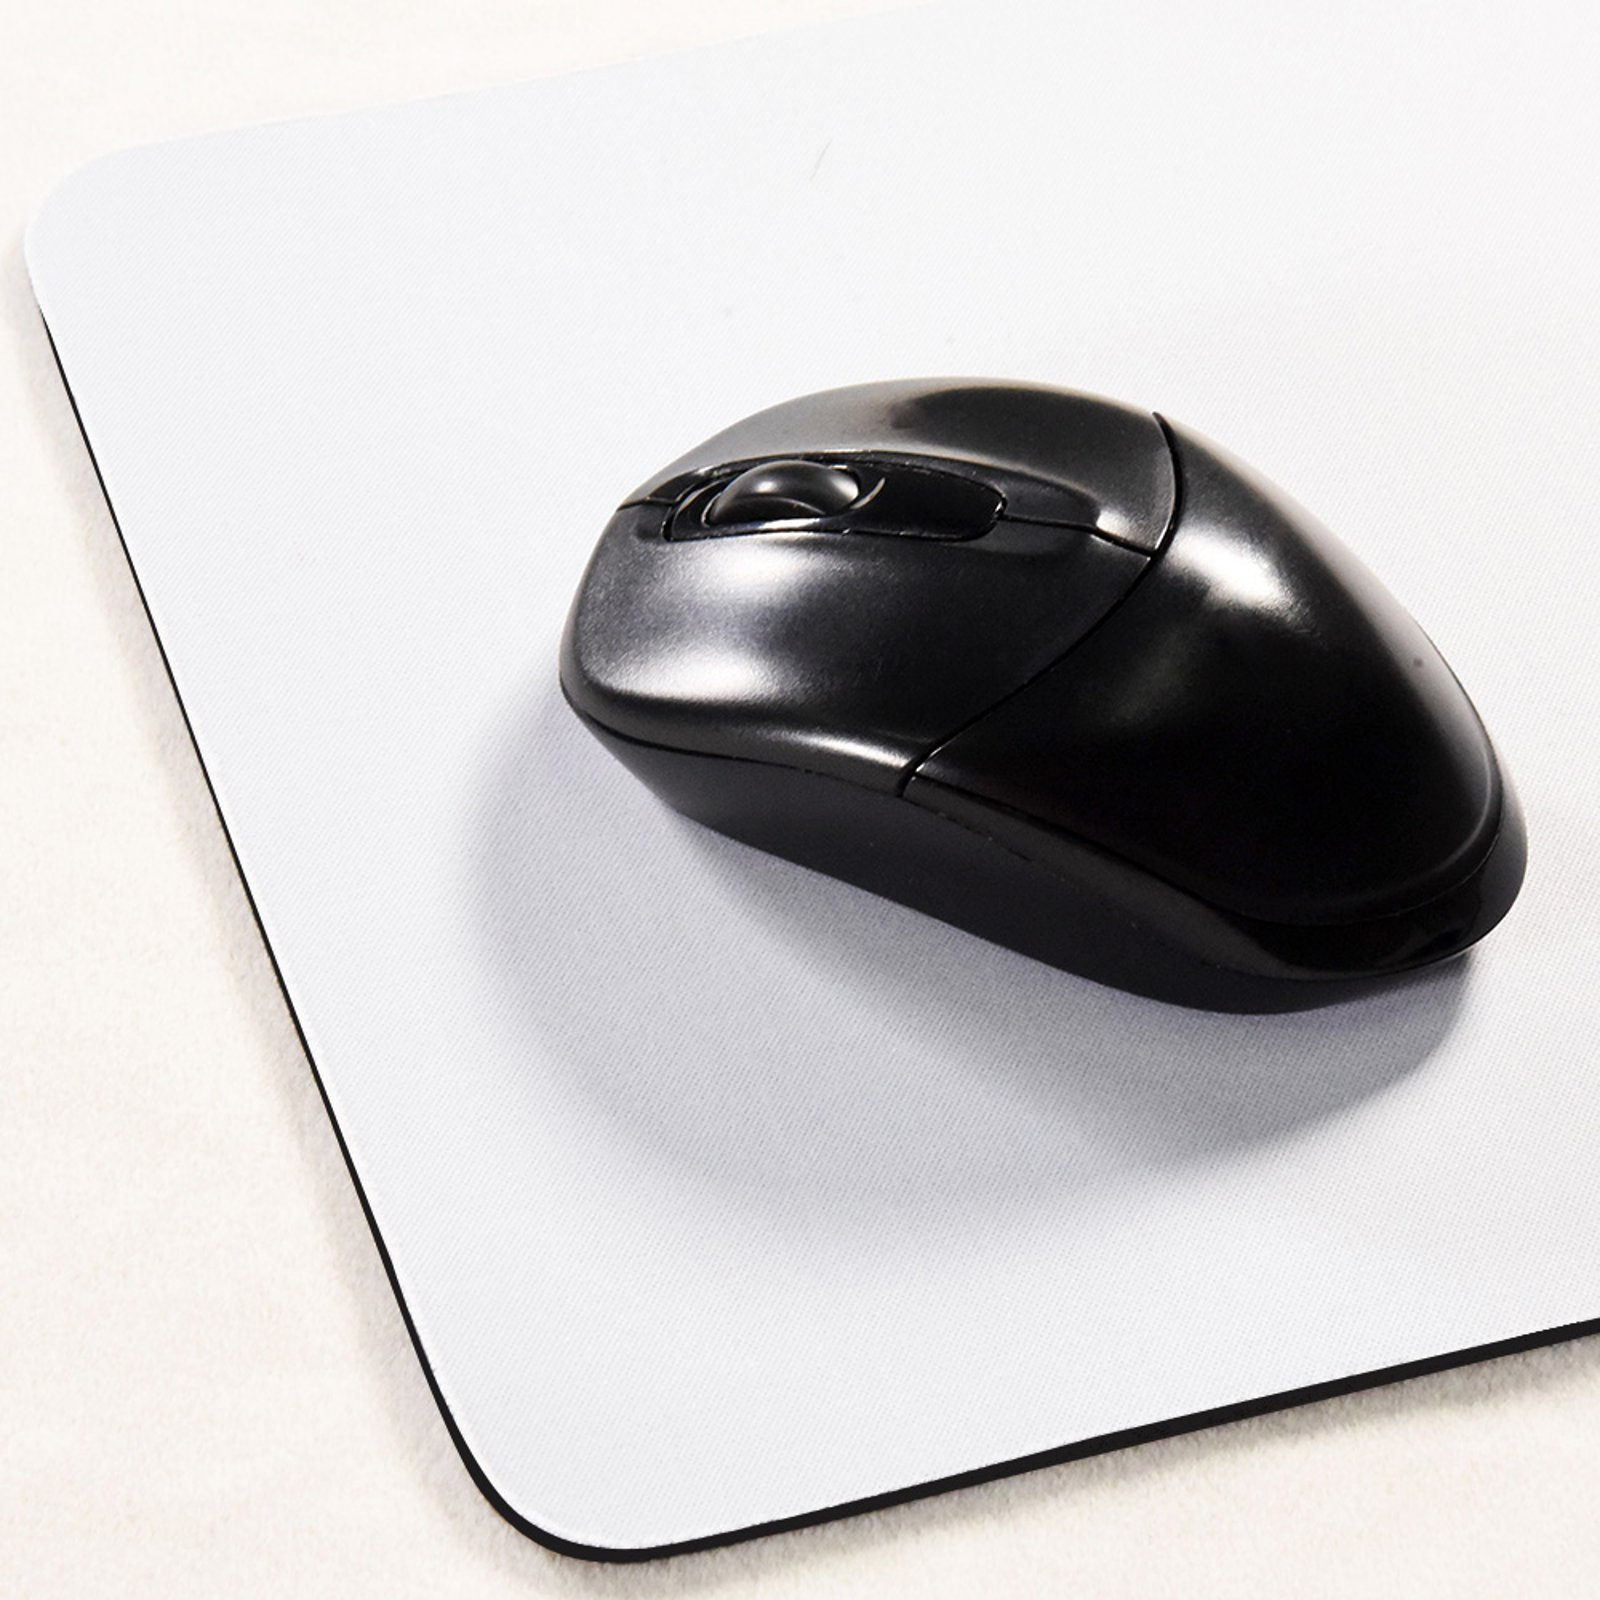 H0a73626b1a944310982e00ce18c91affv - Anime Mousepads